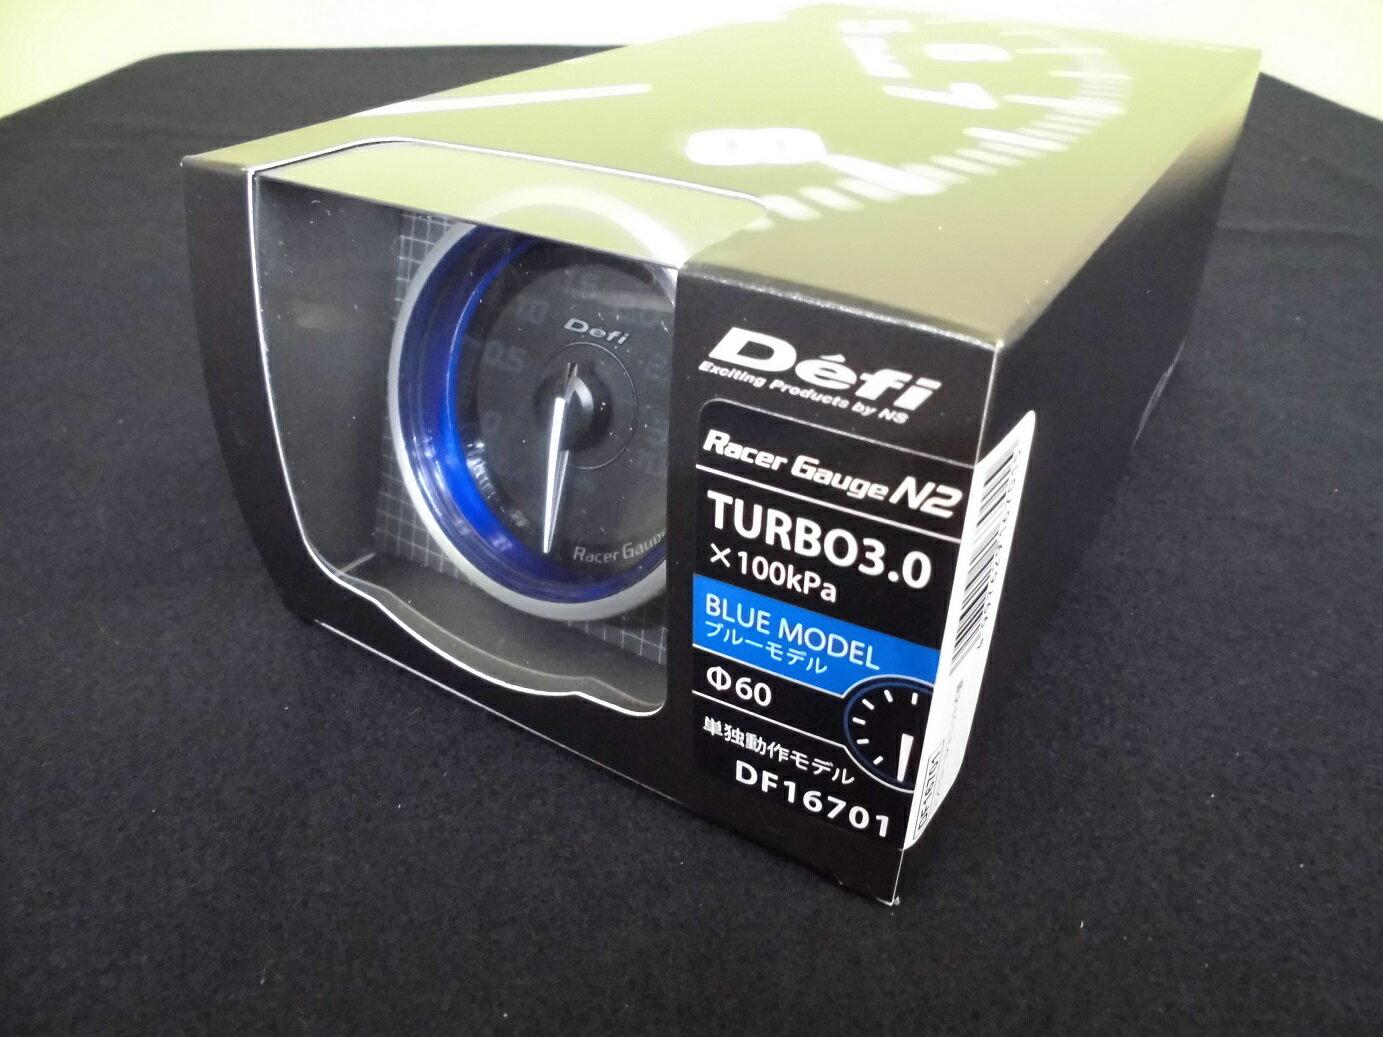 Defi Racer Gauge N2 デフィ レーサーゲージ 60Φ ターボ計 (ブースト計) MAX表示300KPA DF16701「送料無料!!」